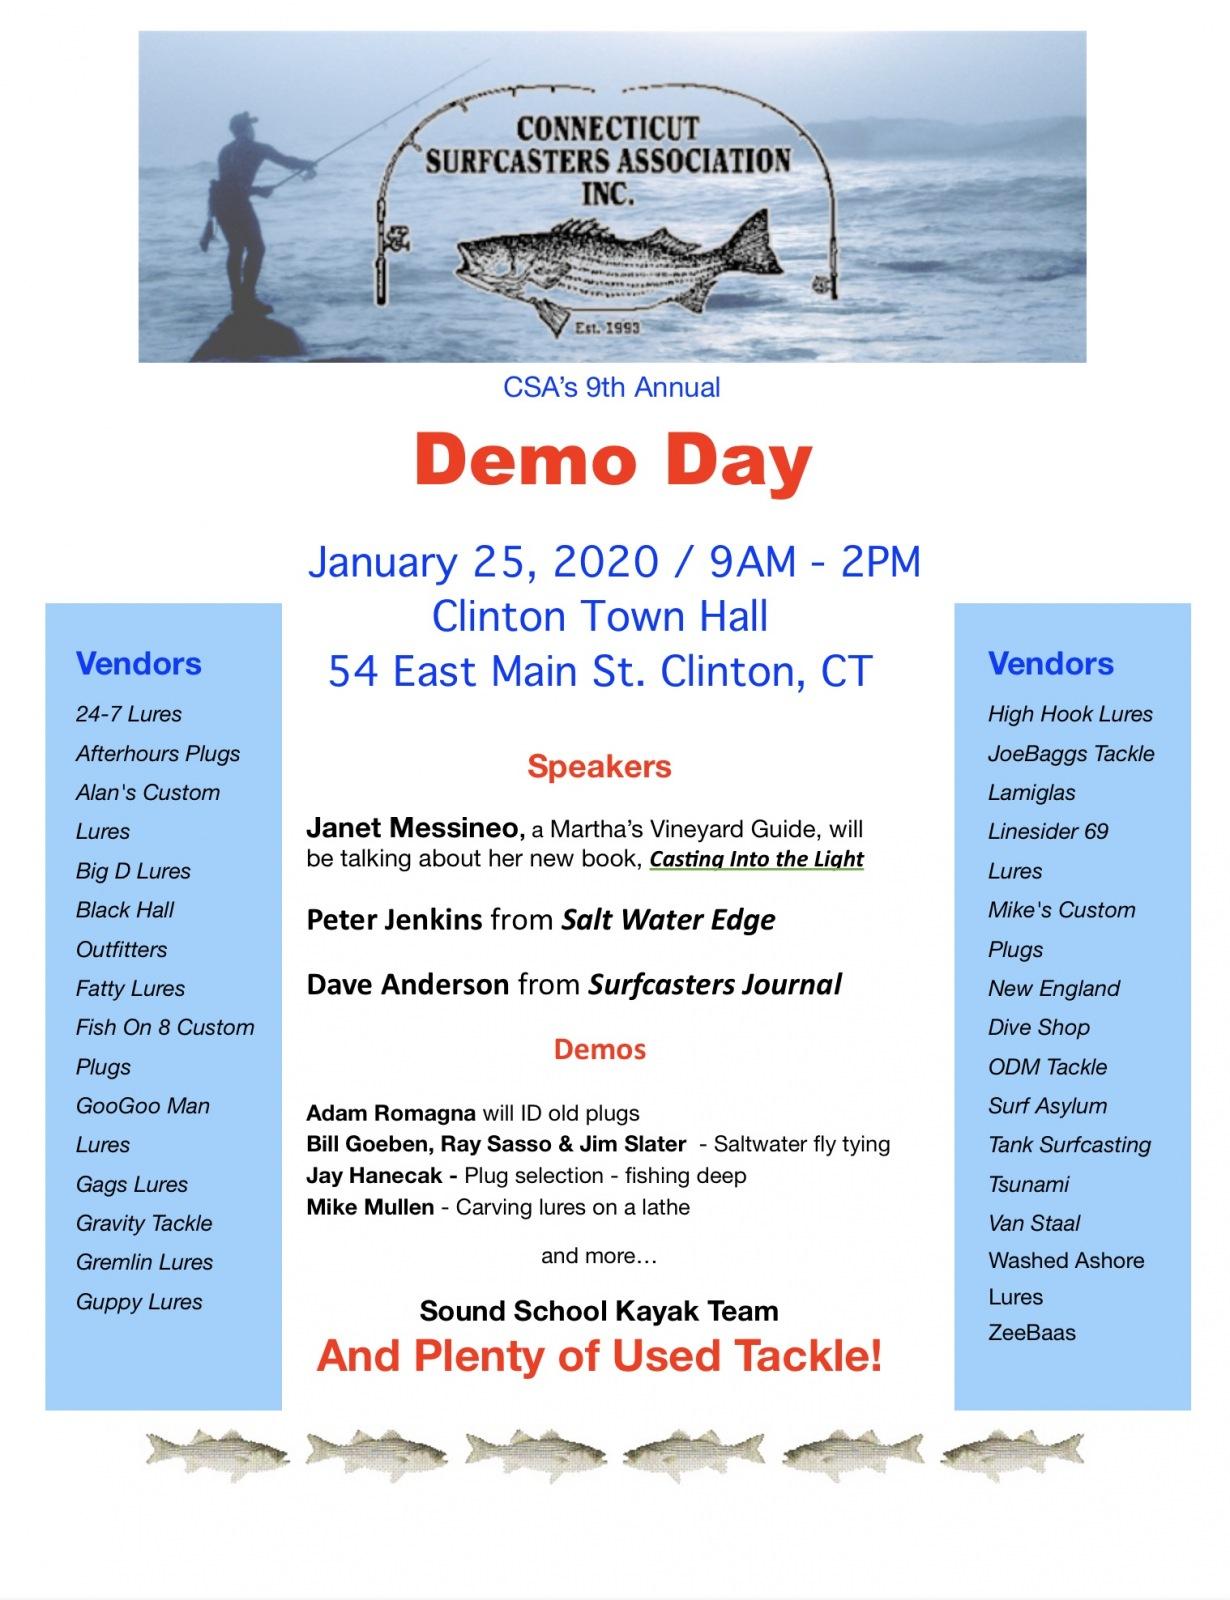 2020 Demo Day Flyer image.jpg